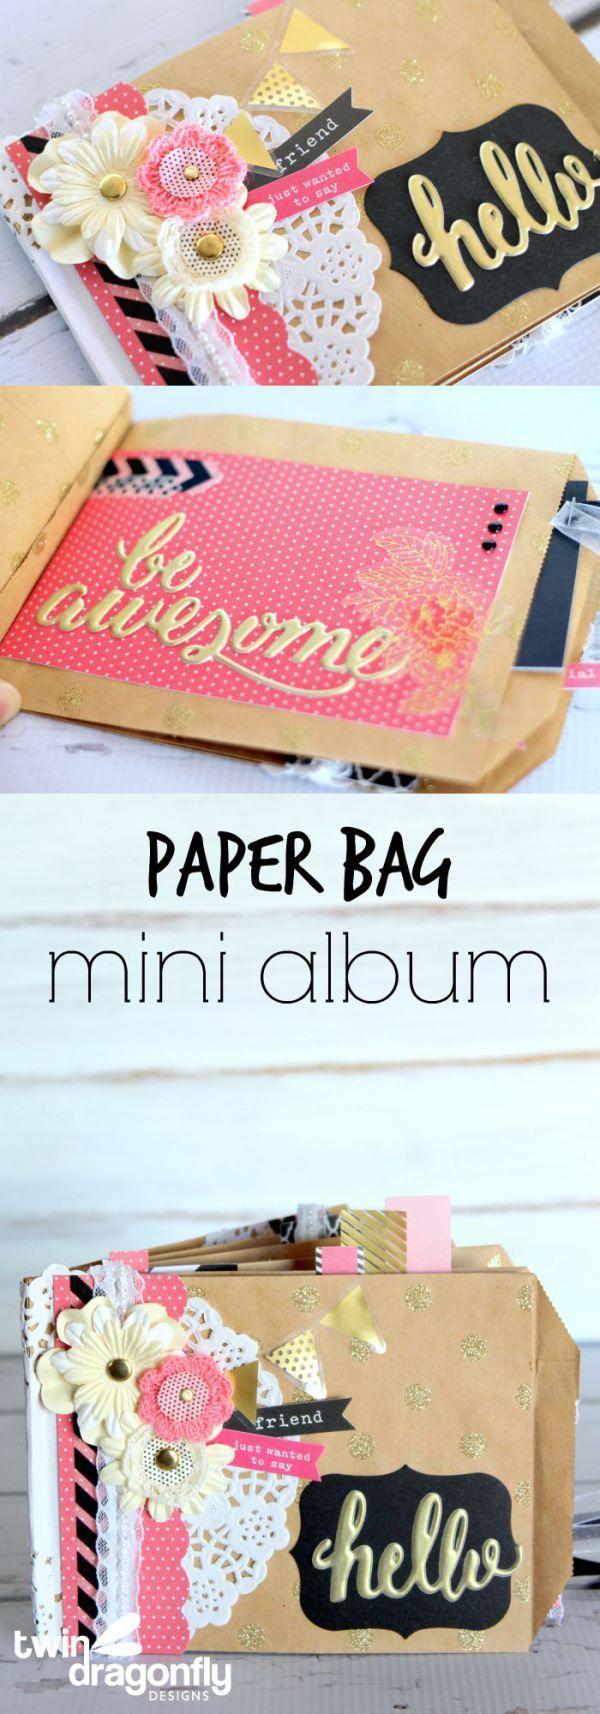 Scrapbook paper books - Paper Bag Mini Album